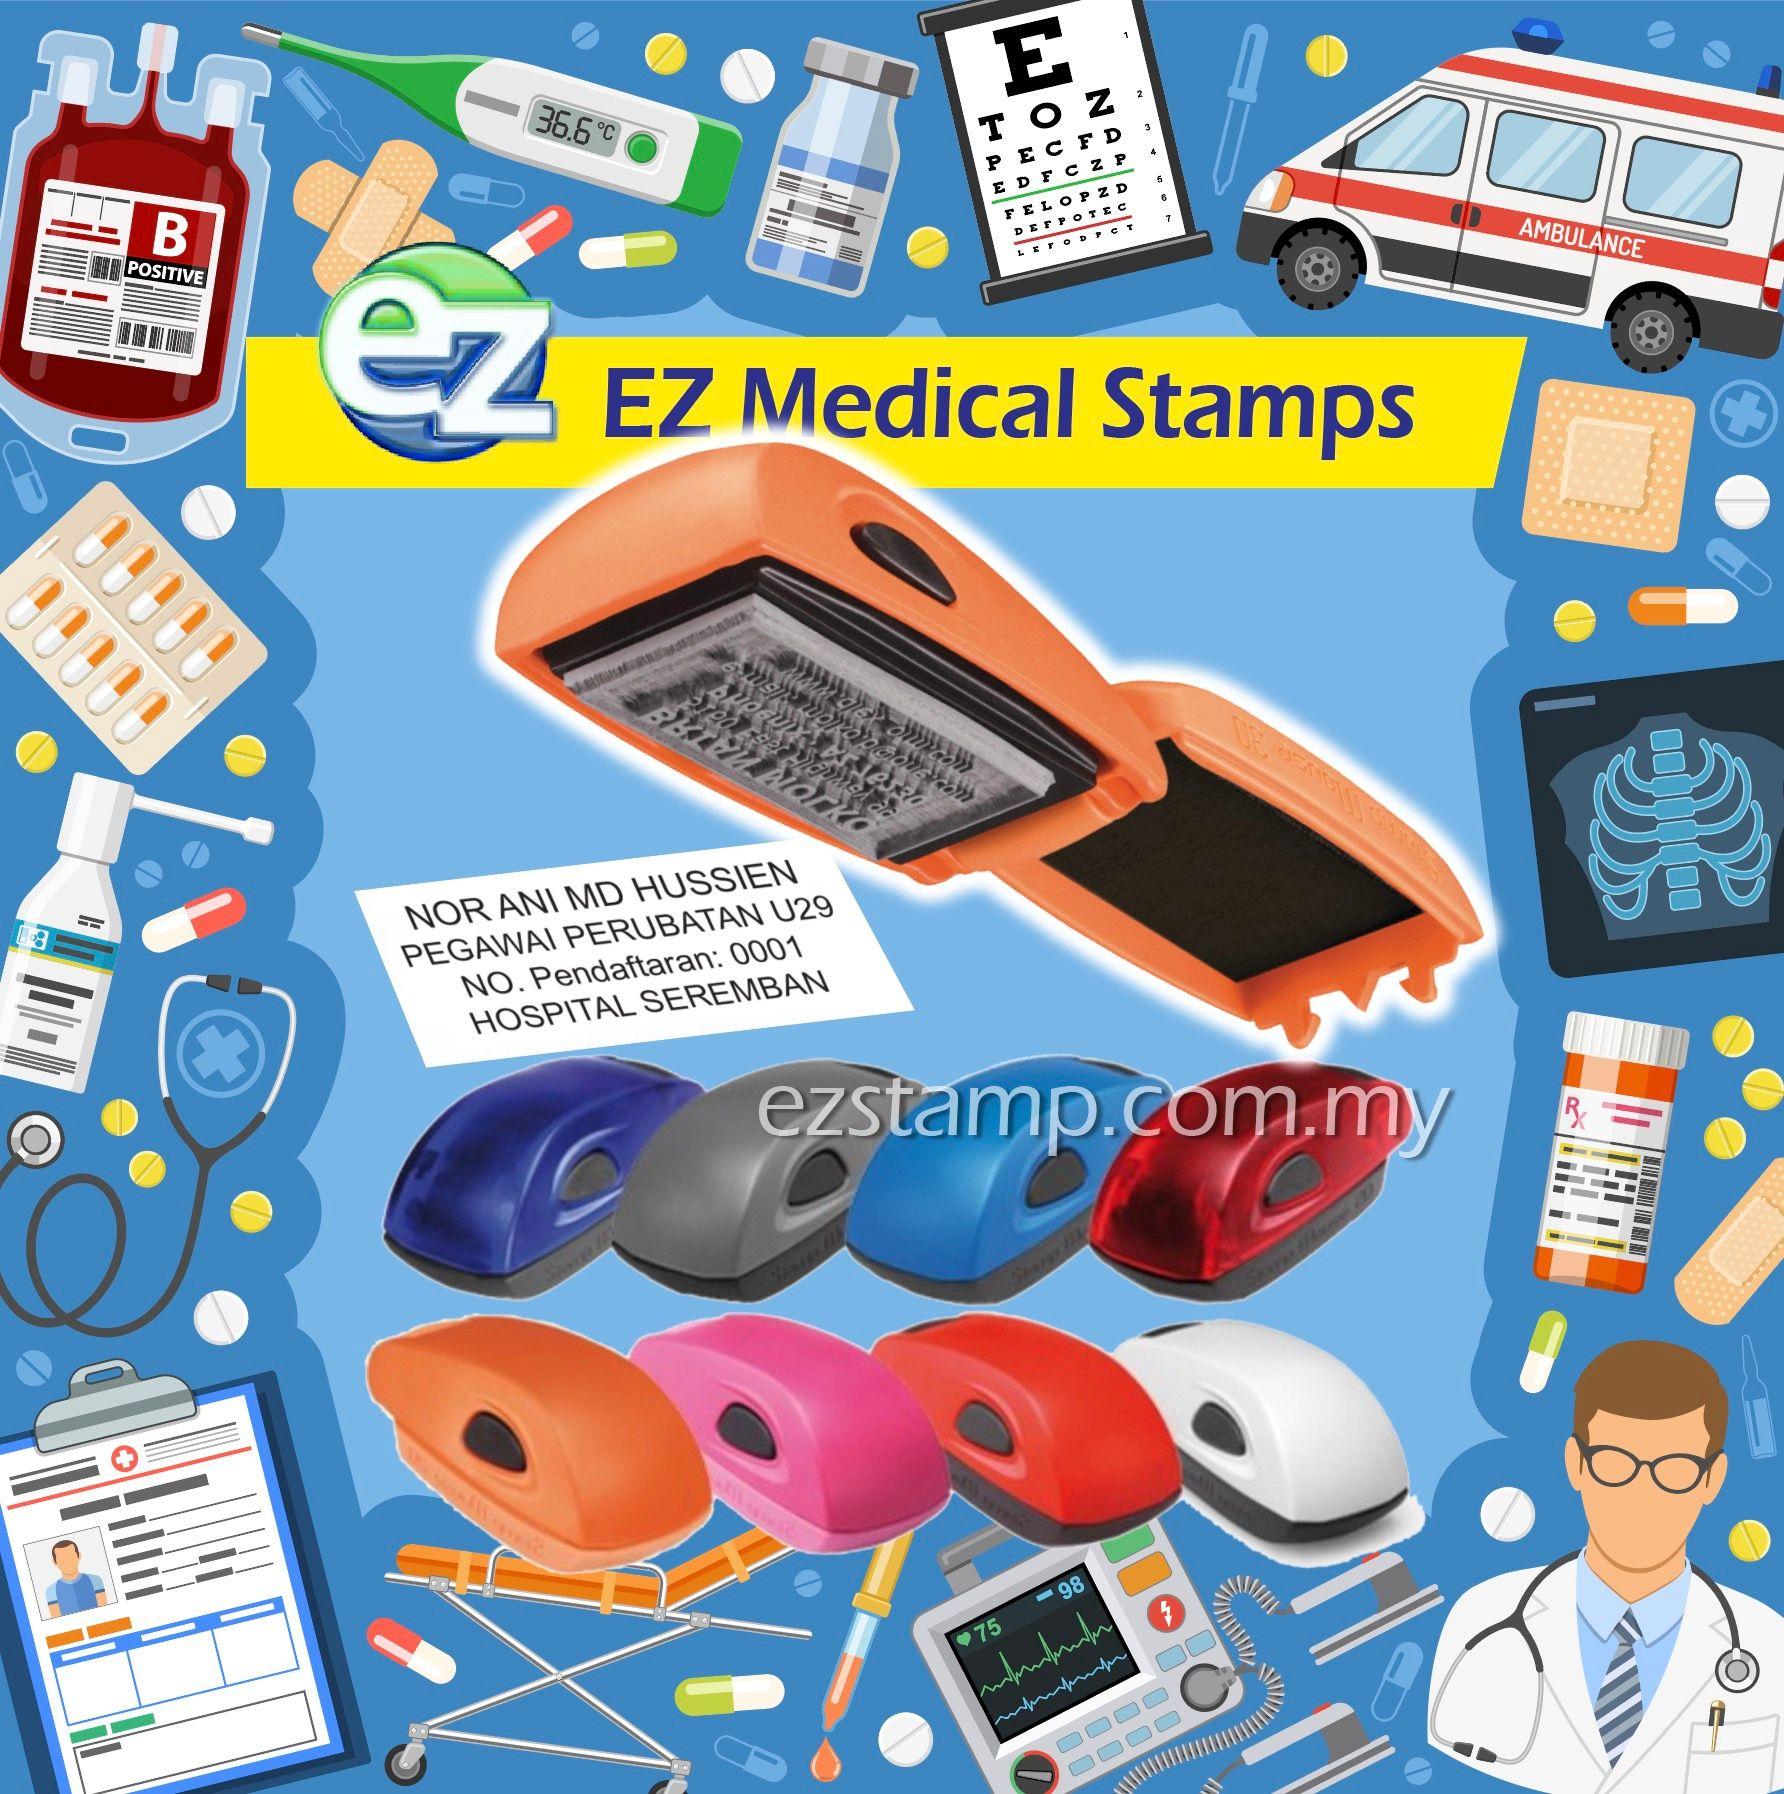 Ez Stamp Cop Utk Pegawai Perubatan Nurses Doctor Di Malaysia Kami Ada Pelbagai Pilihan Design Utk Dipilih S Nurse Self Inking Stamps Healthcare Provider